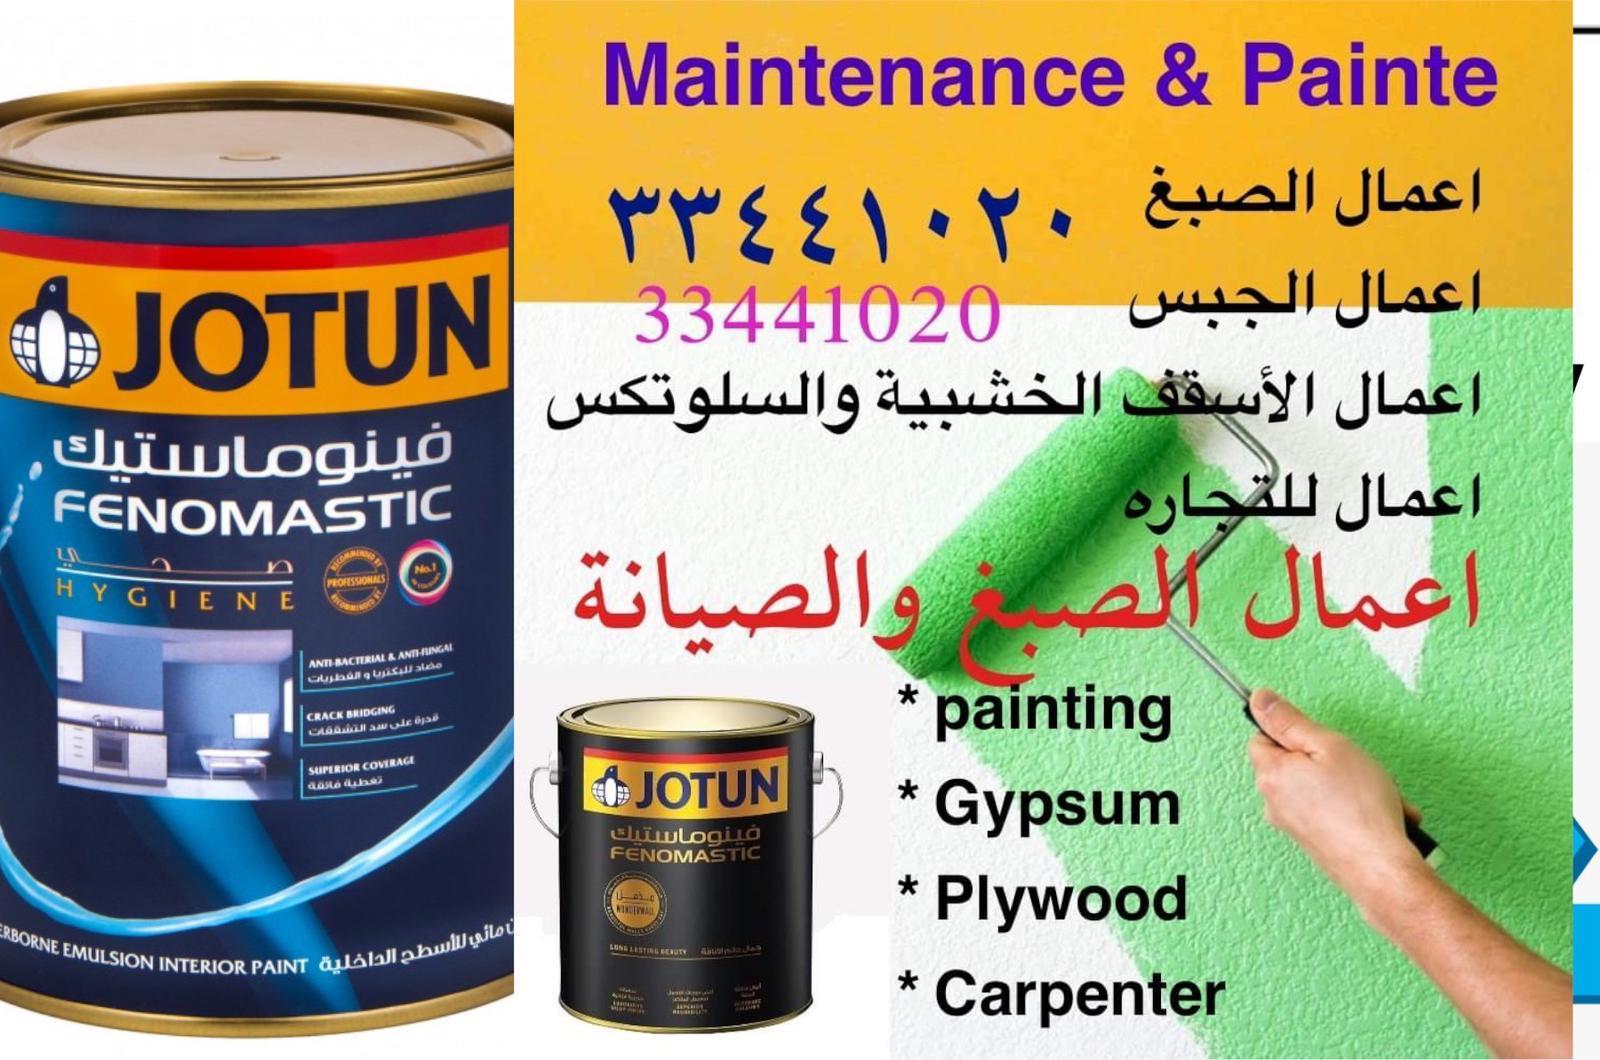 Painter- Gypsum Partition- Repairing work - 334410